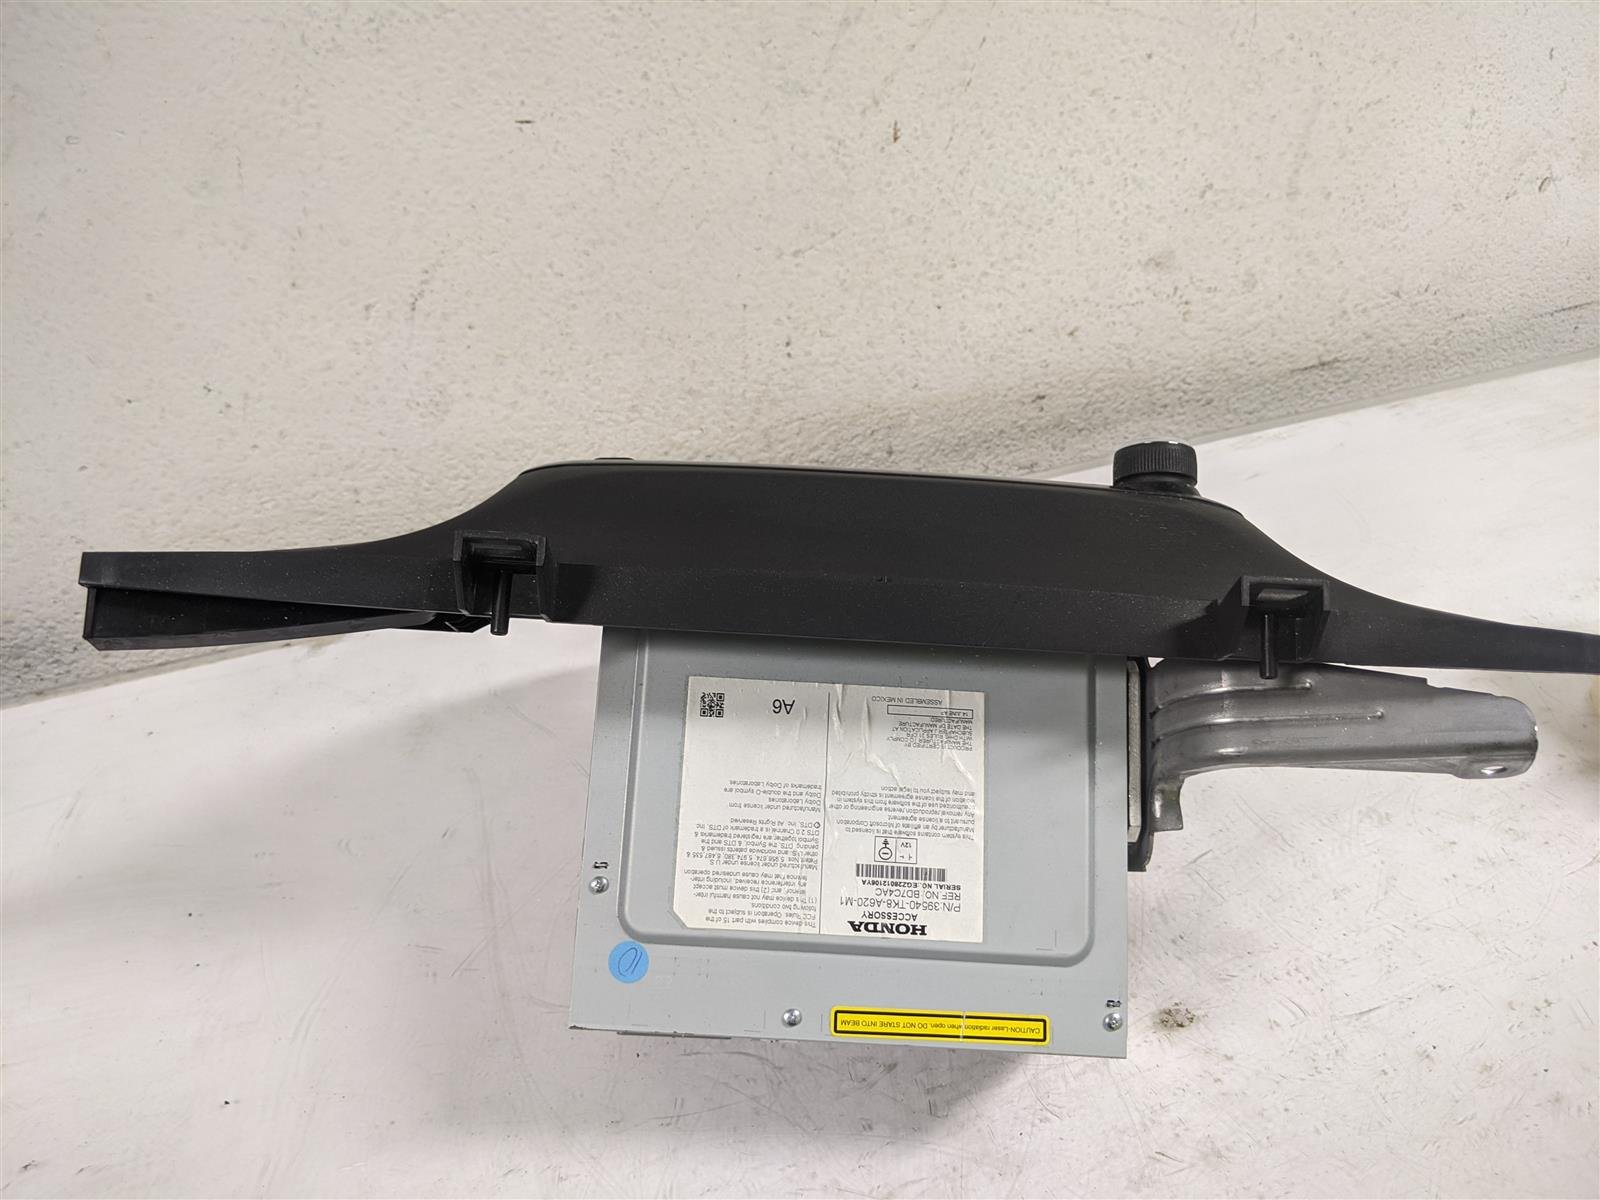 2014 Honda Odyssey Navigation Am Fm Radio Assembly Replacement